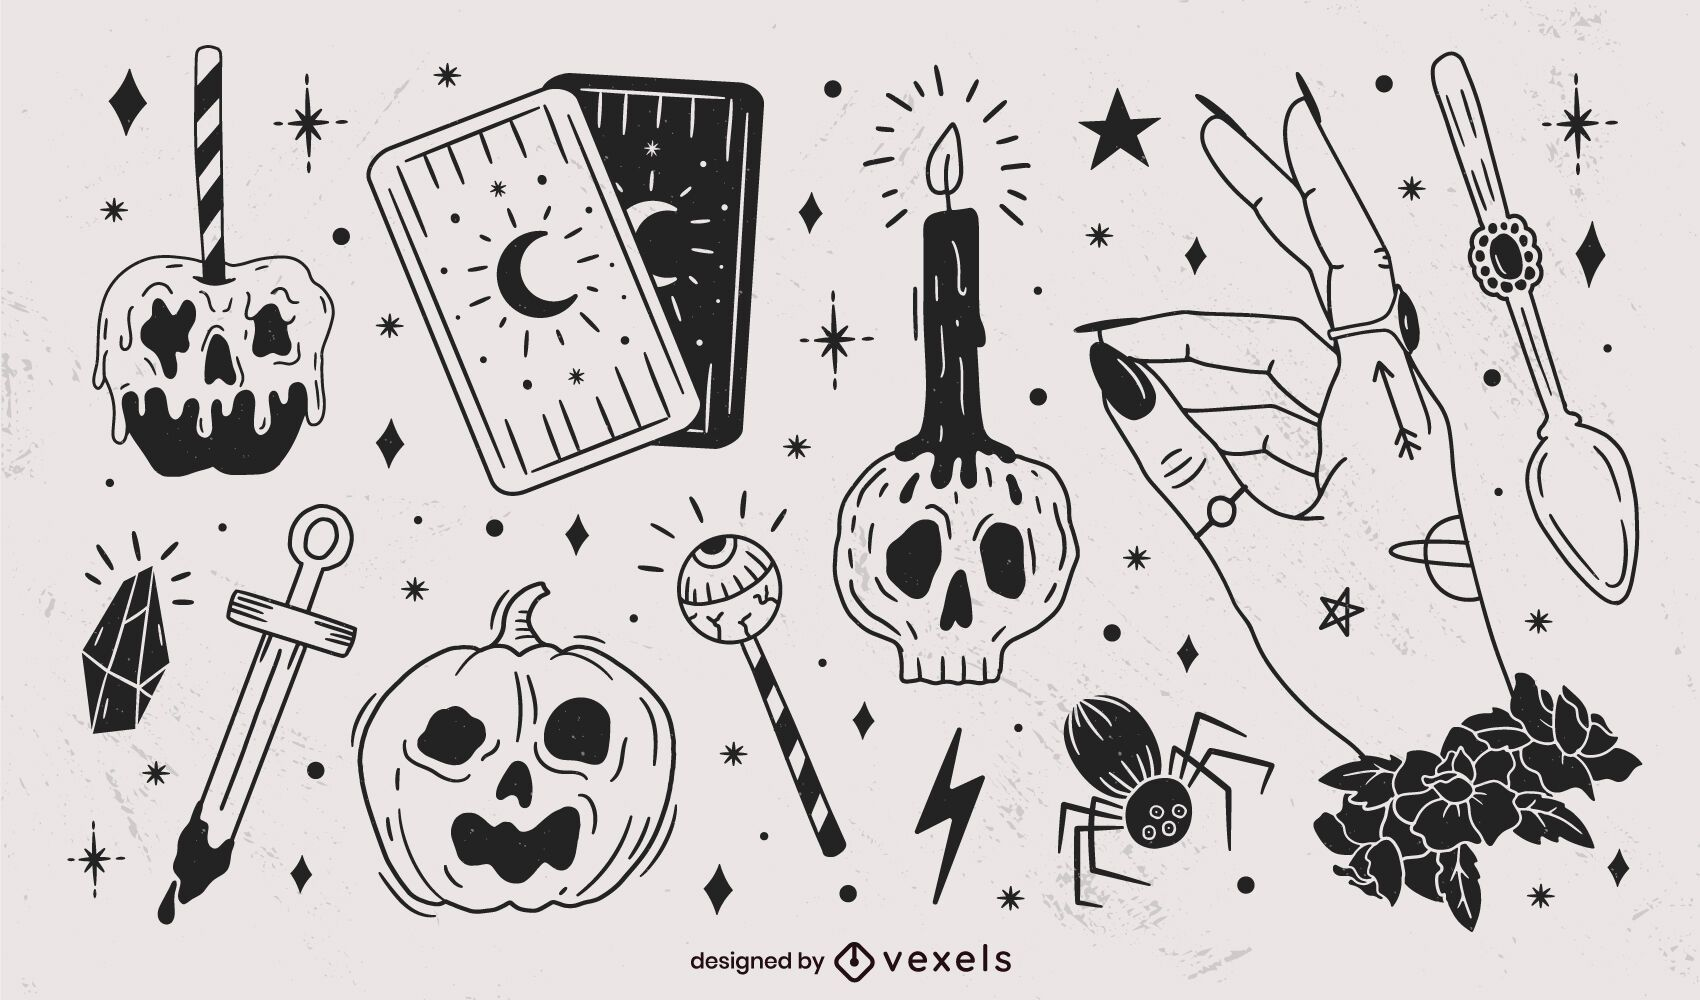 Paquete de elementos negros de Halloween dibujados a mano